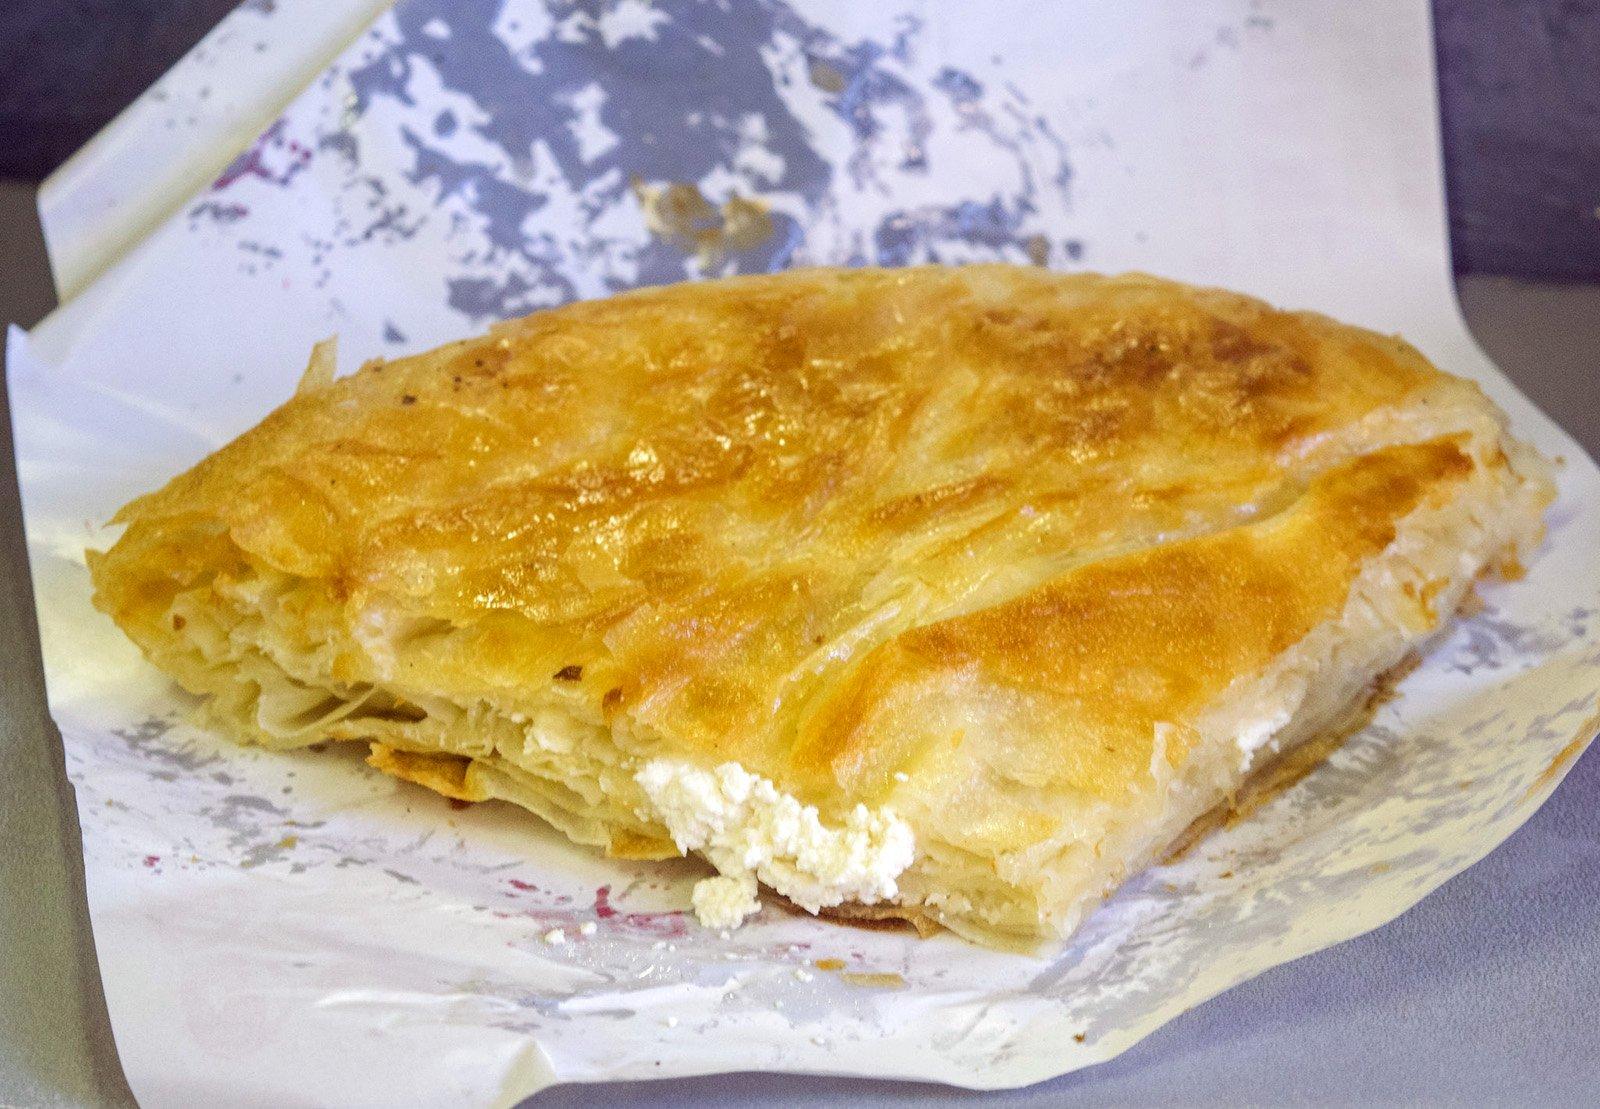 Serbian Food - Top Serbian Dishes to Try in Belgrade - Burek © Bojan Rantaša / Flickr